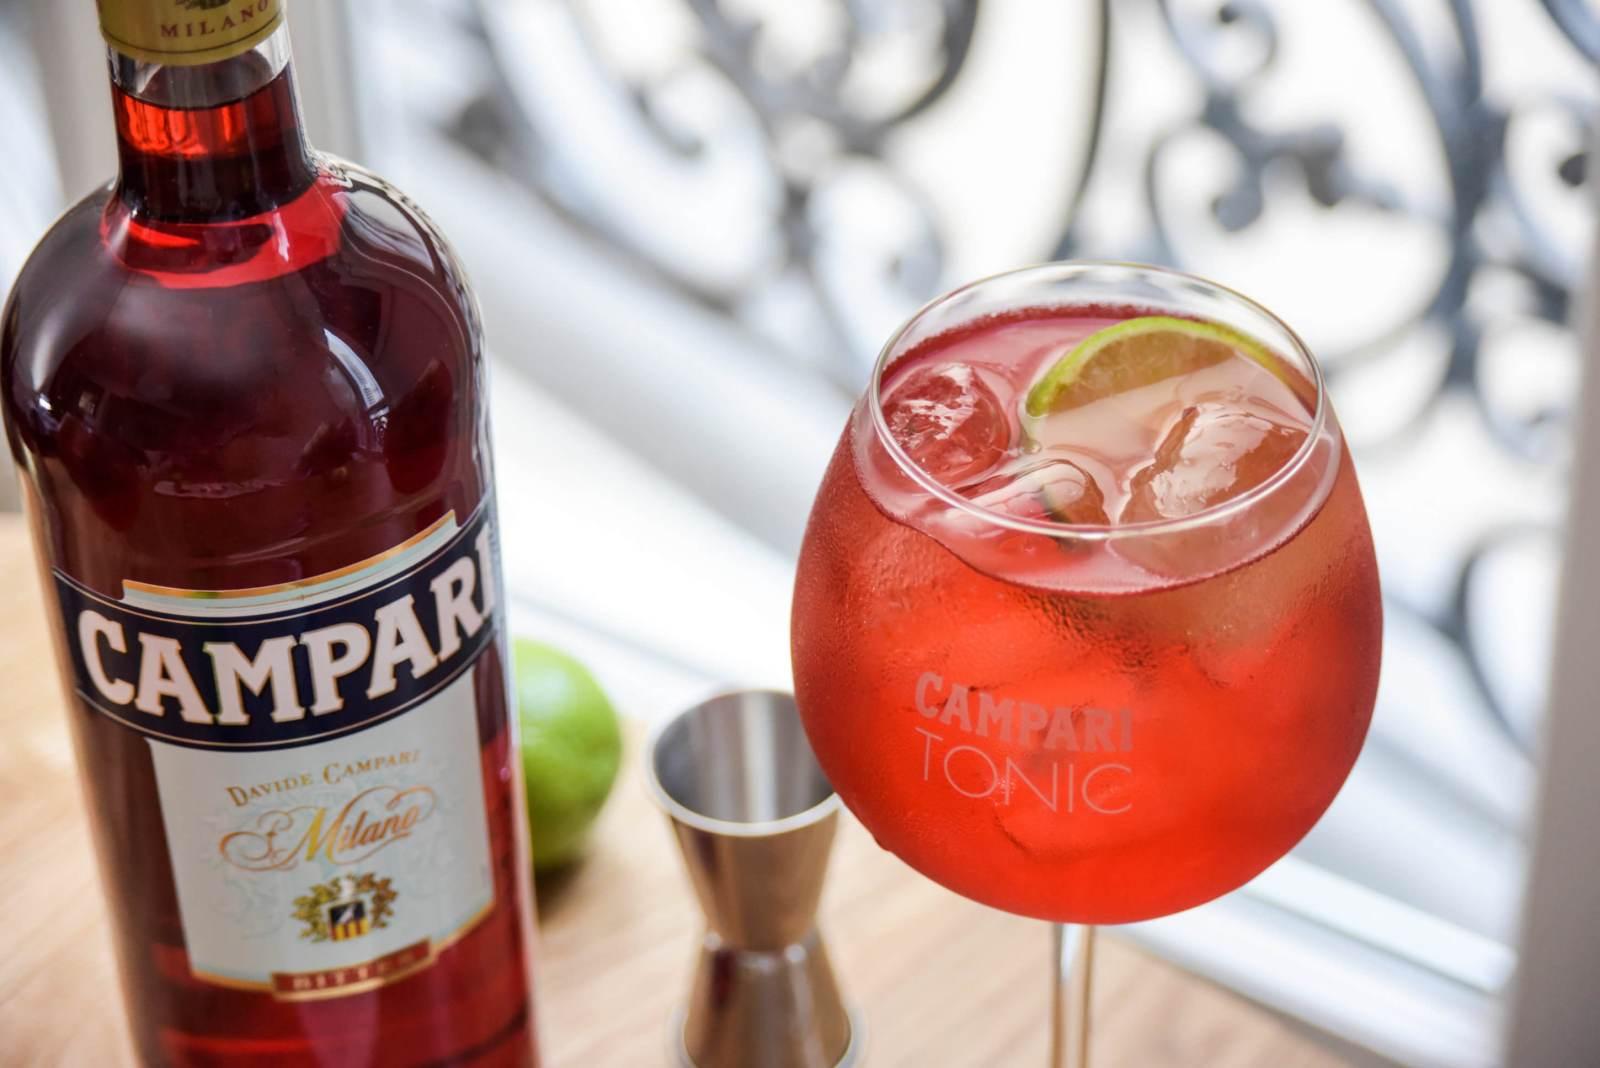 recette Campari Tonic cocktail